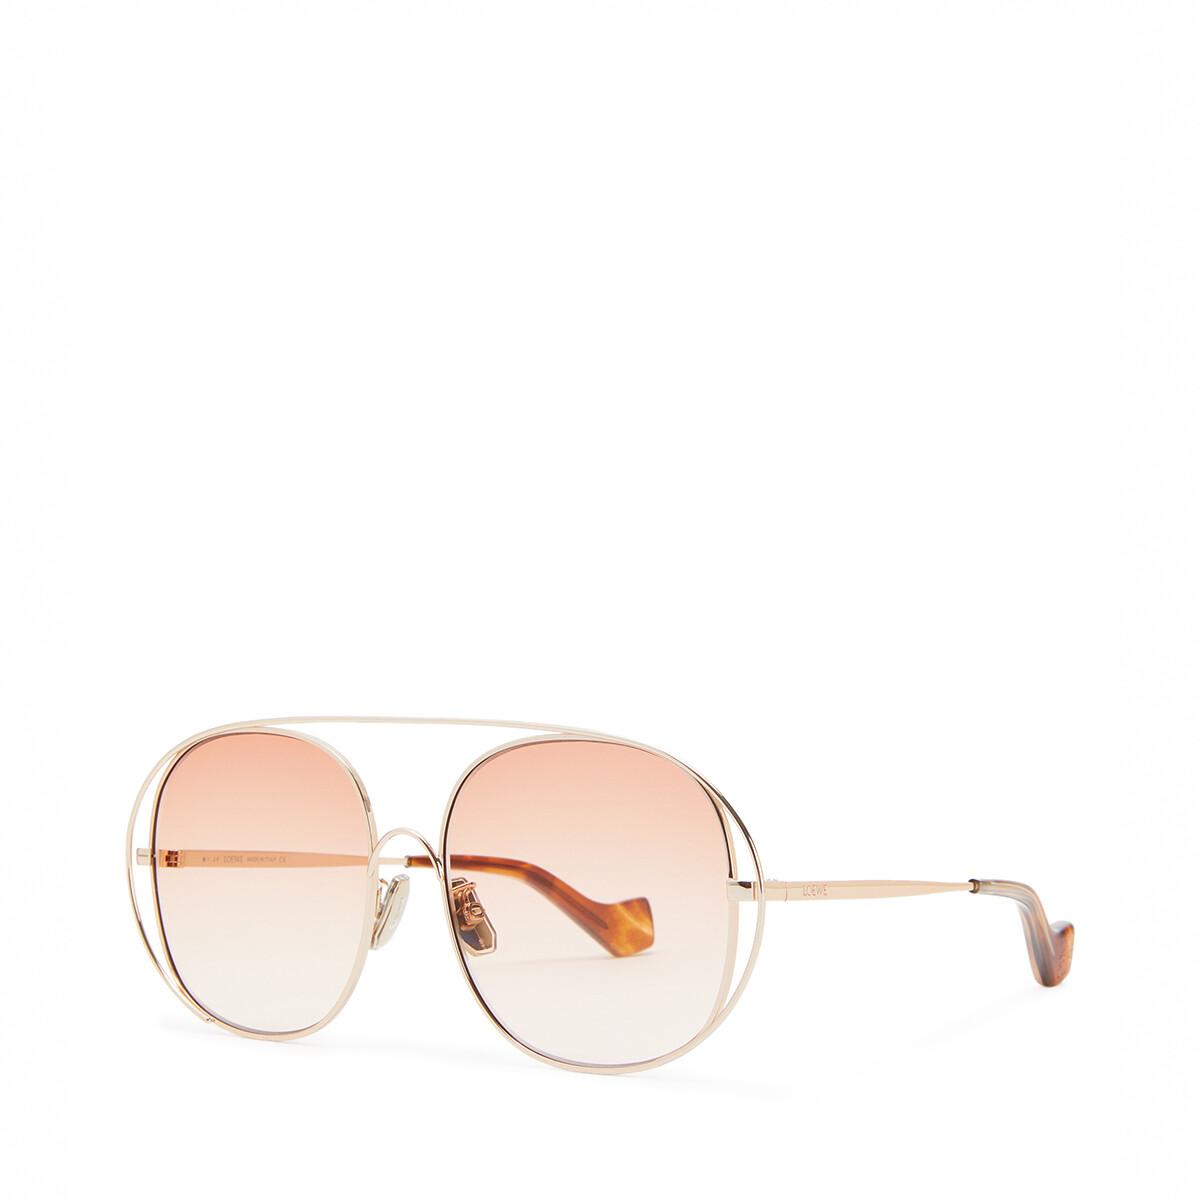 LOEWE Metal Round Sunglasses Peach front